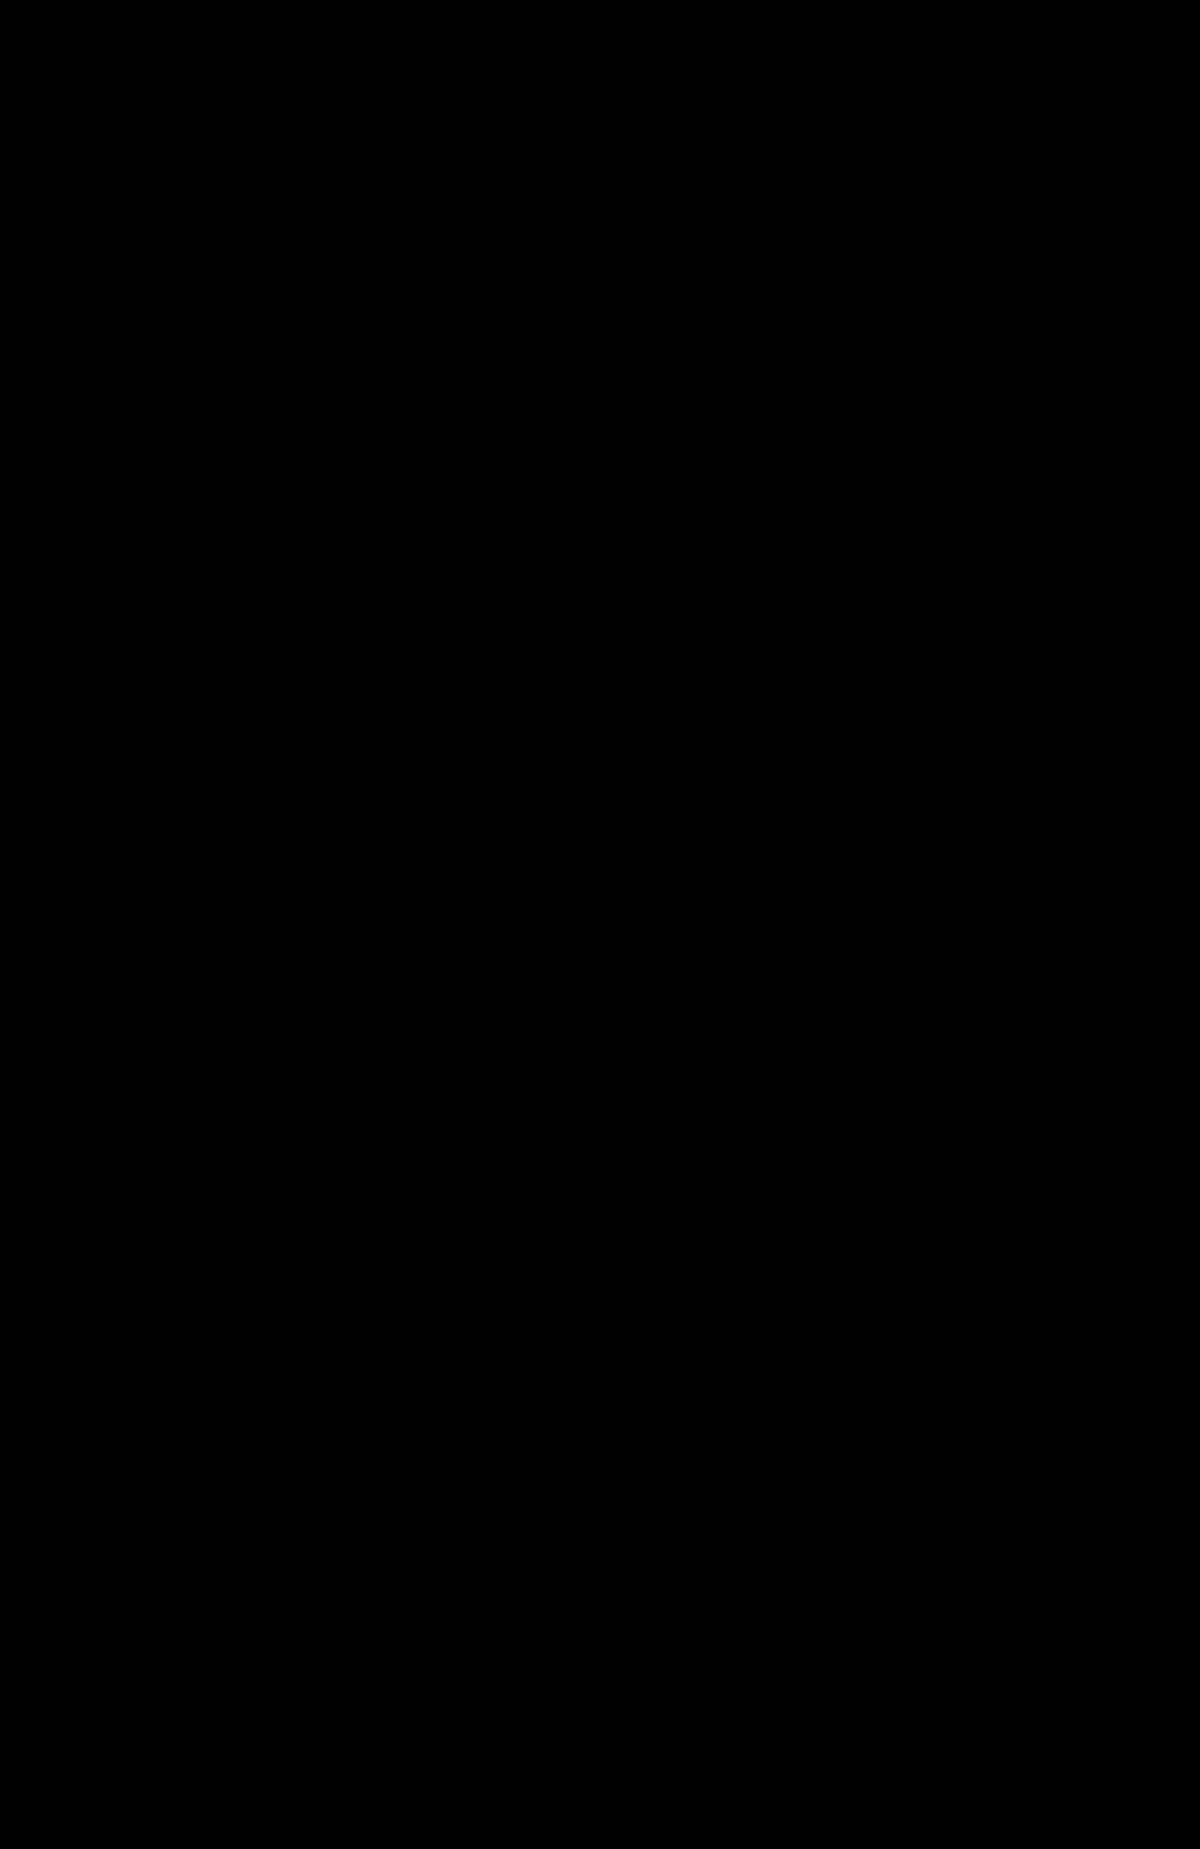 Isosceles triangle.